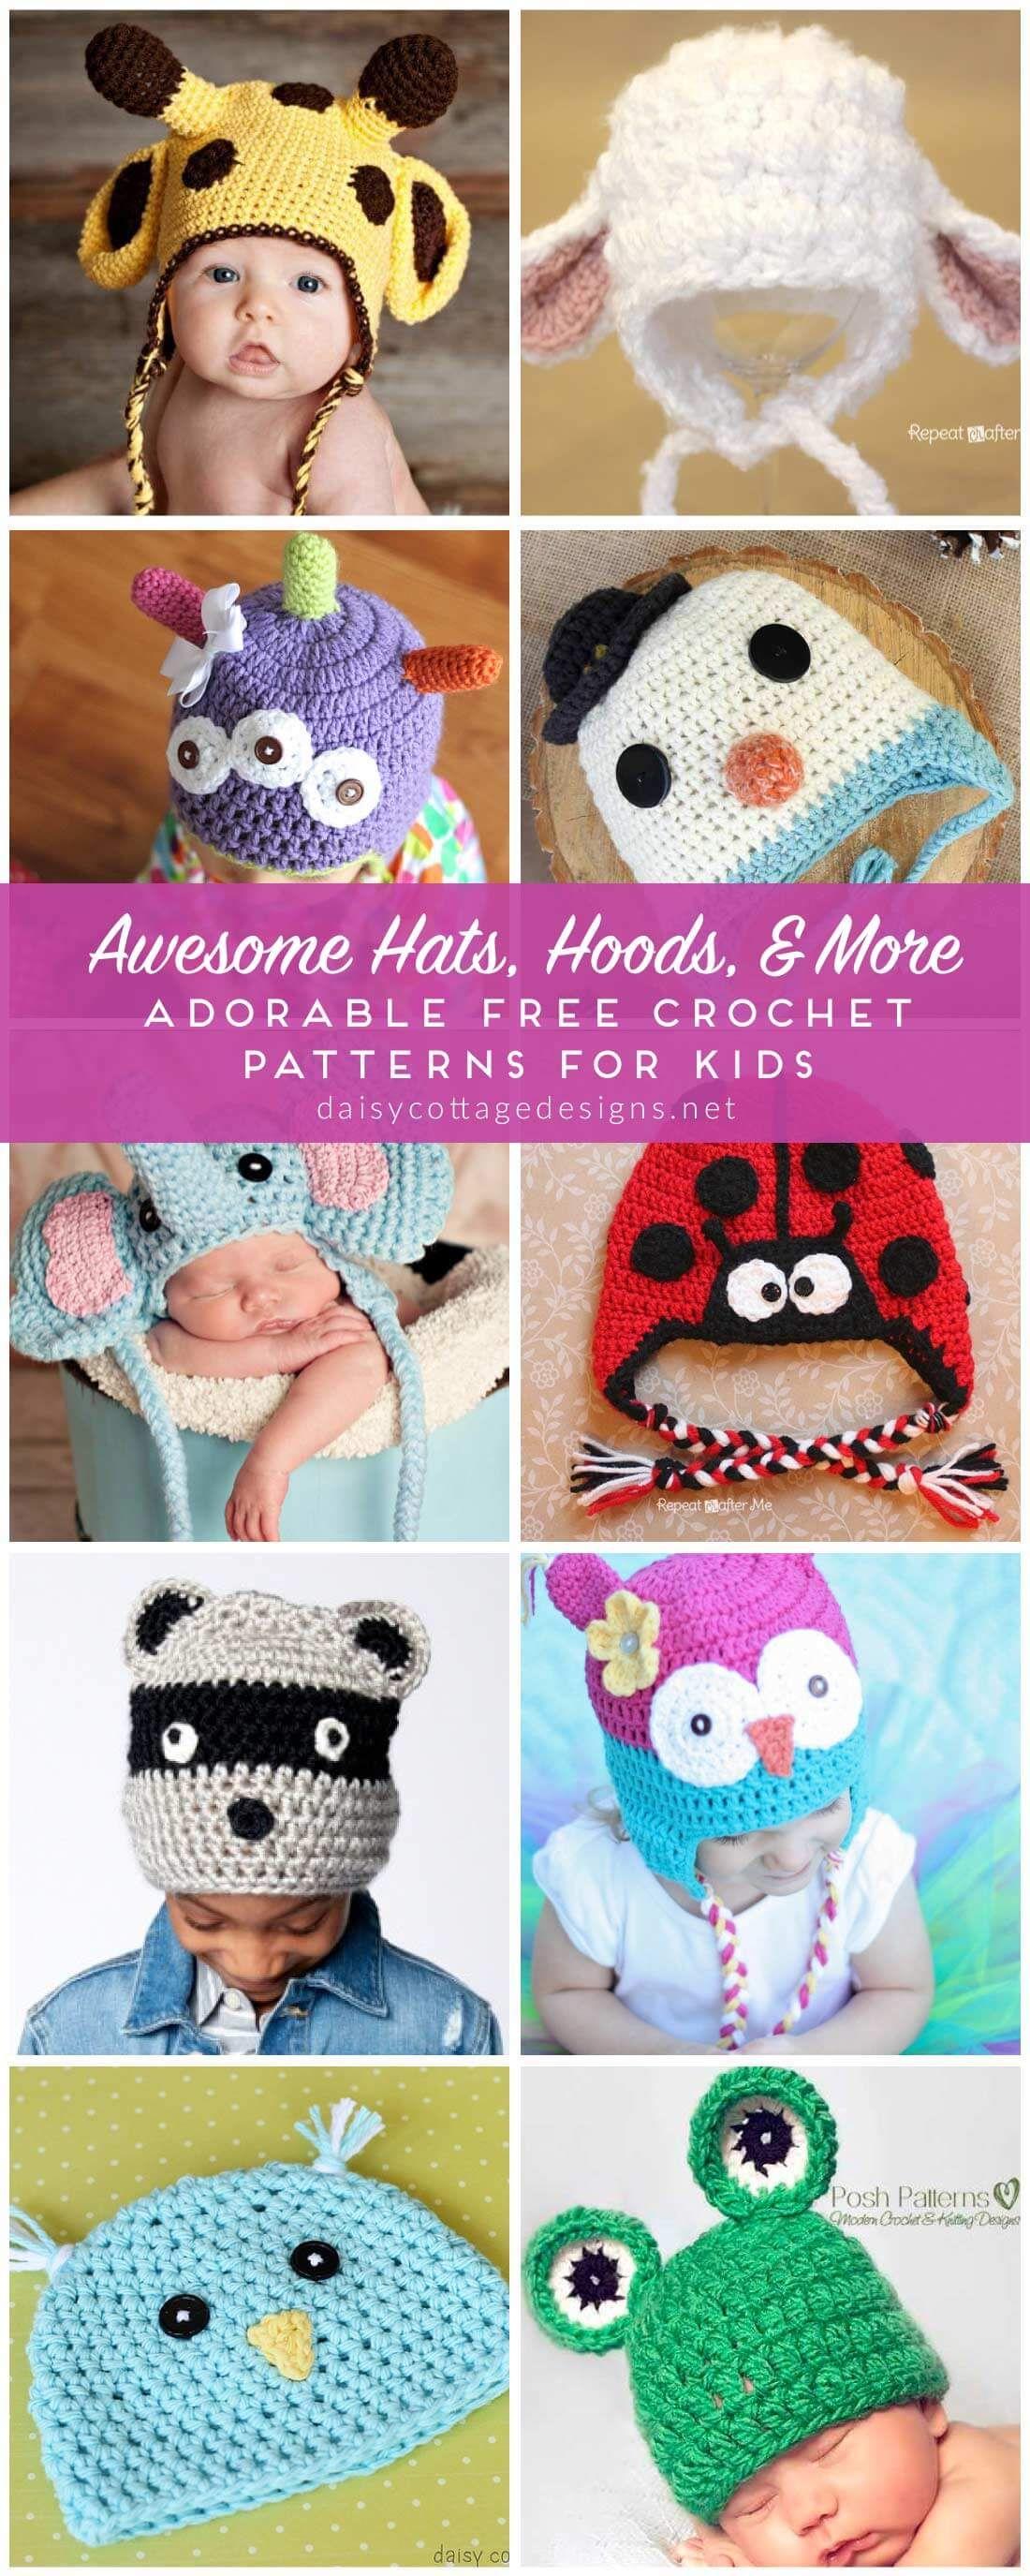 Crochet Hat Patterns for Kids | Pinterest | Crochet hood, Hood ...